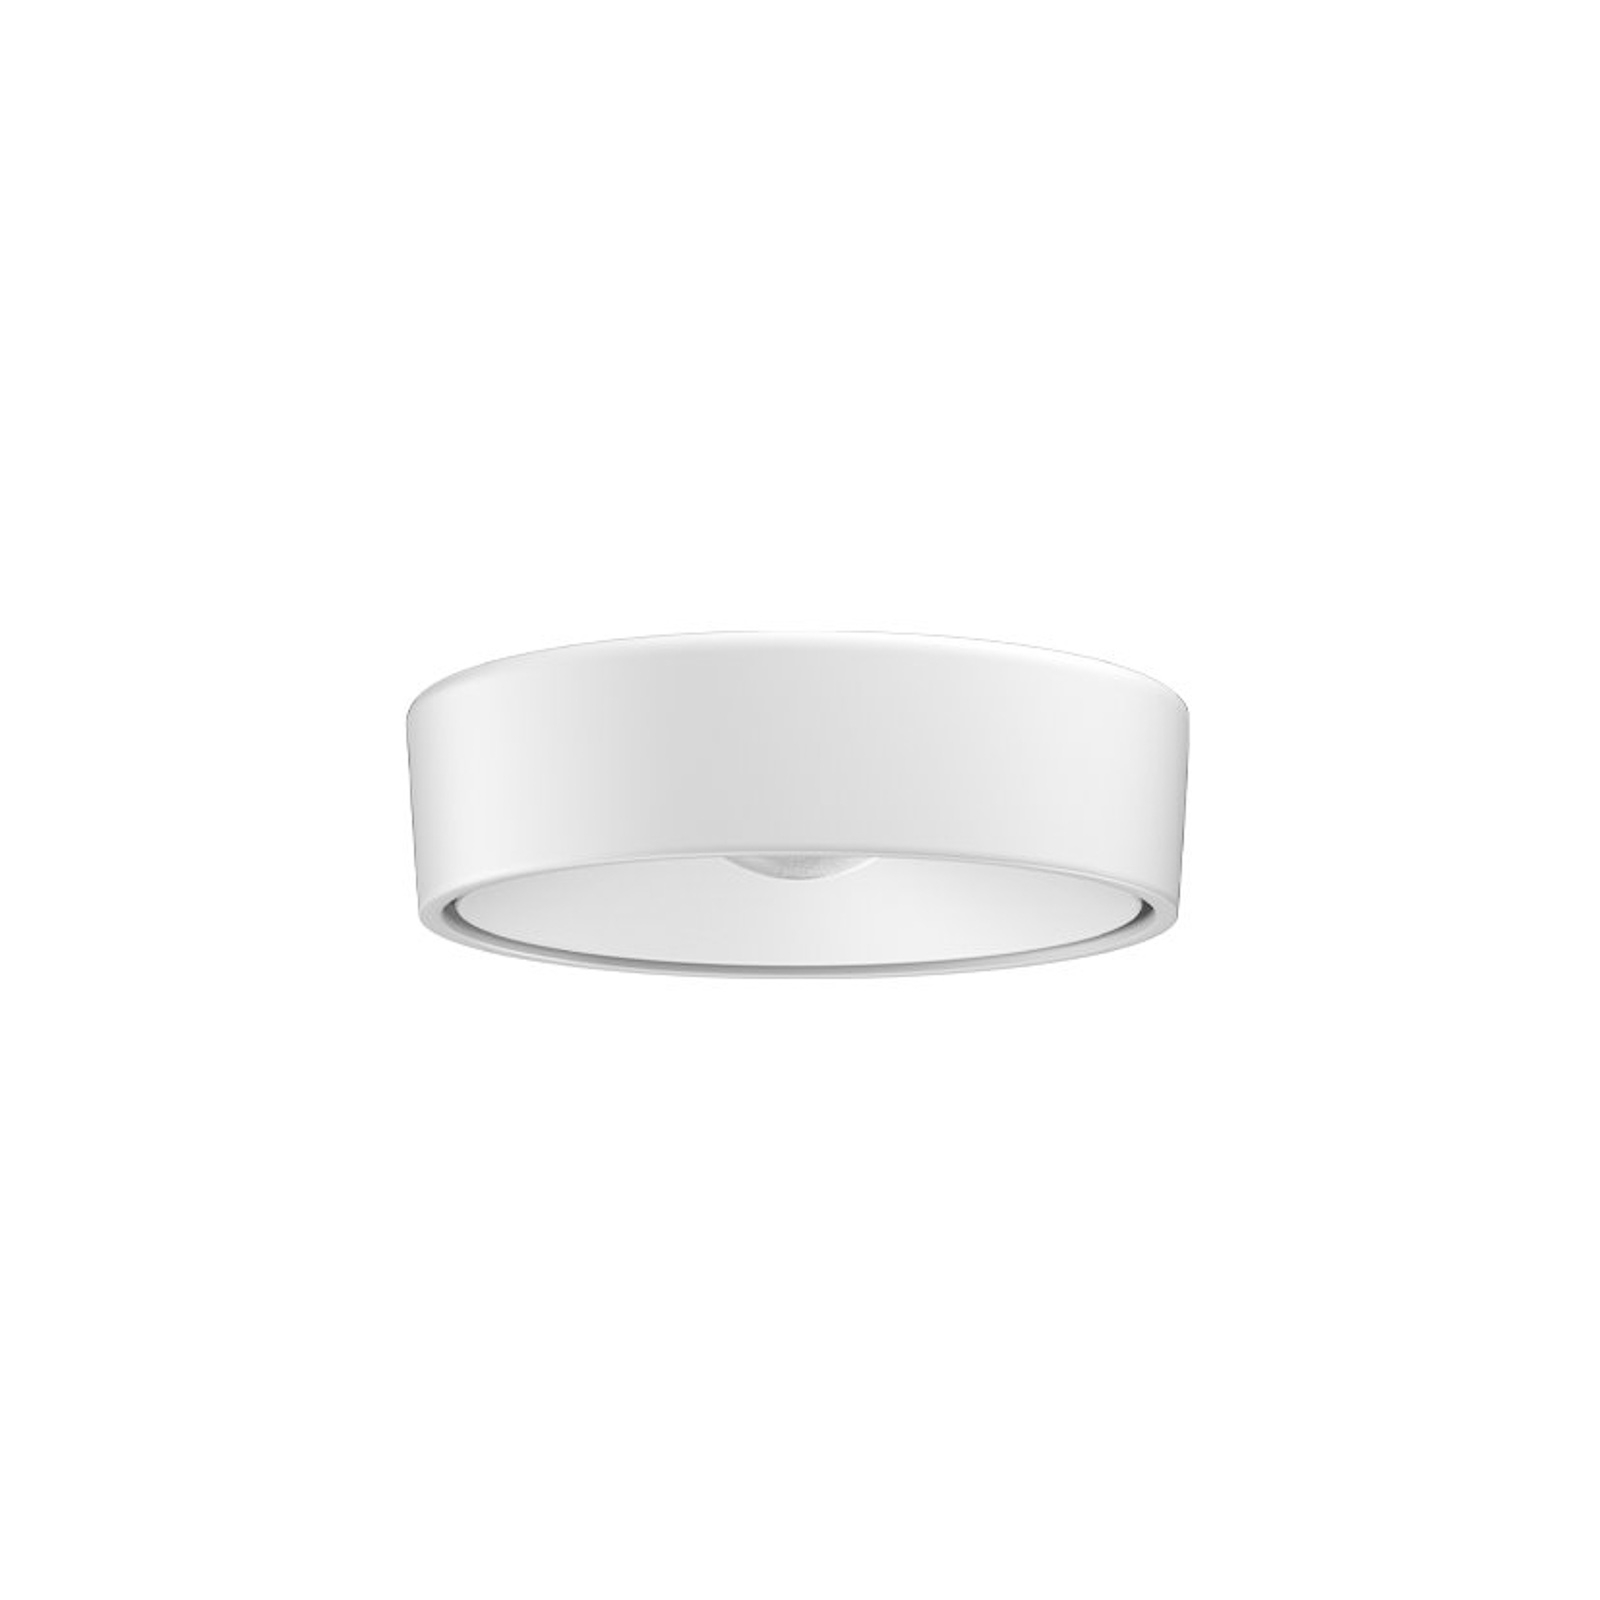 Ribag Kivo Deckenlampe Phase Cut 14cm 2.700K weiß